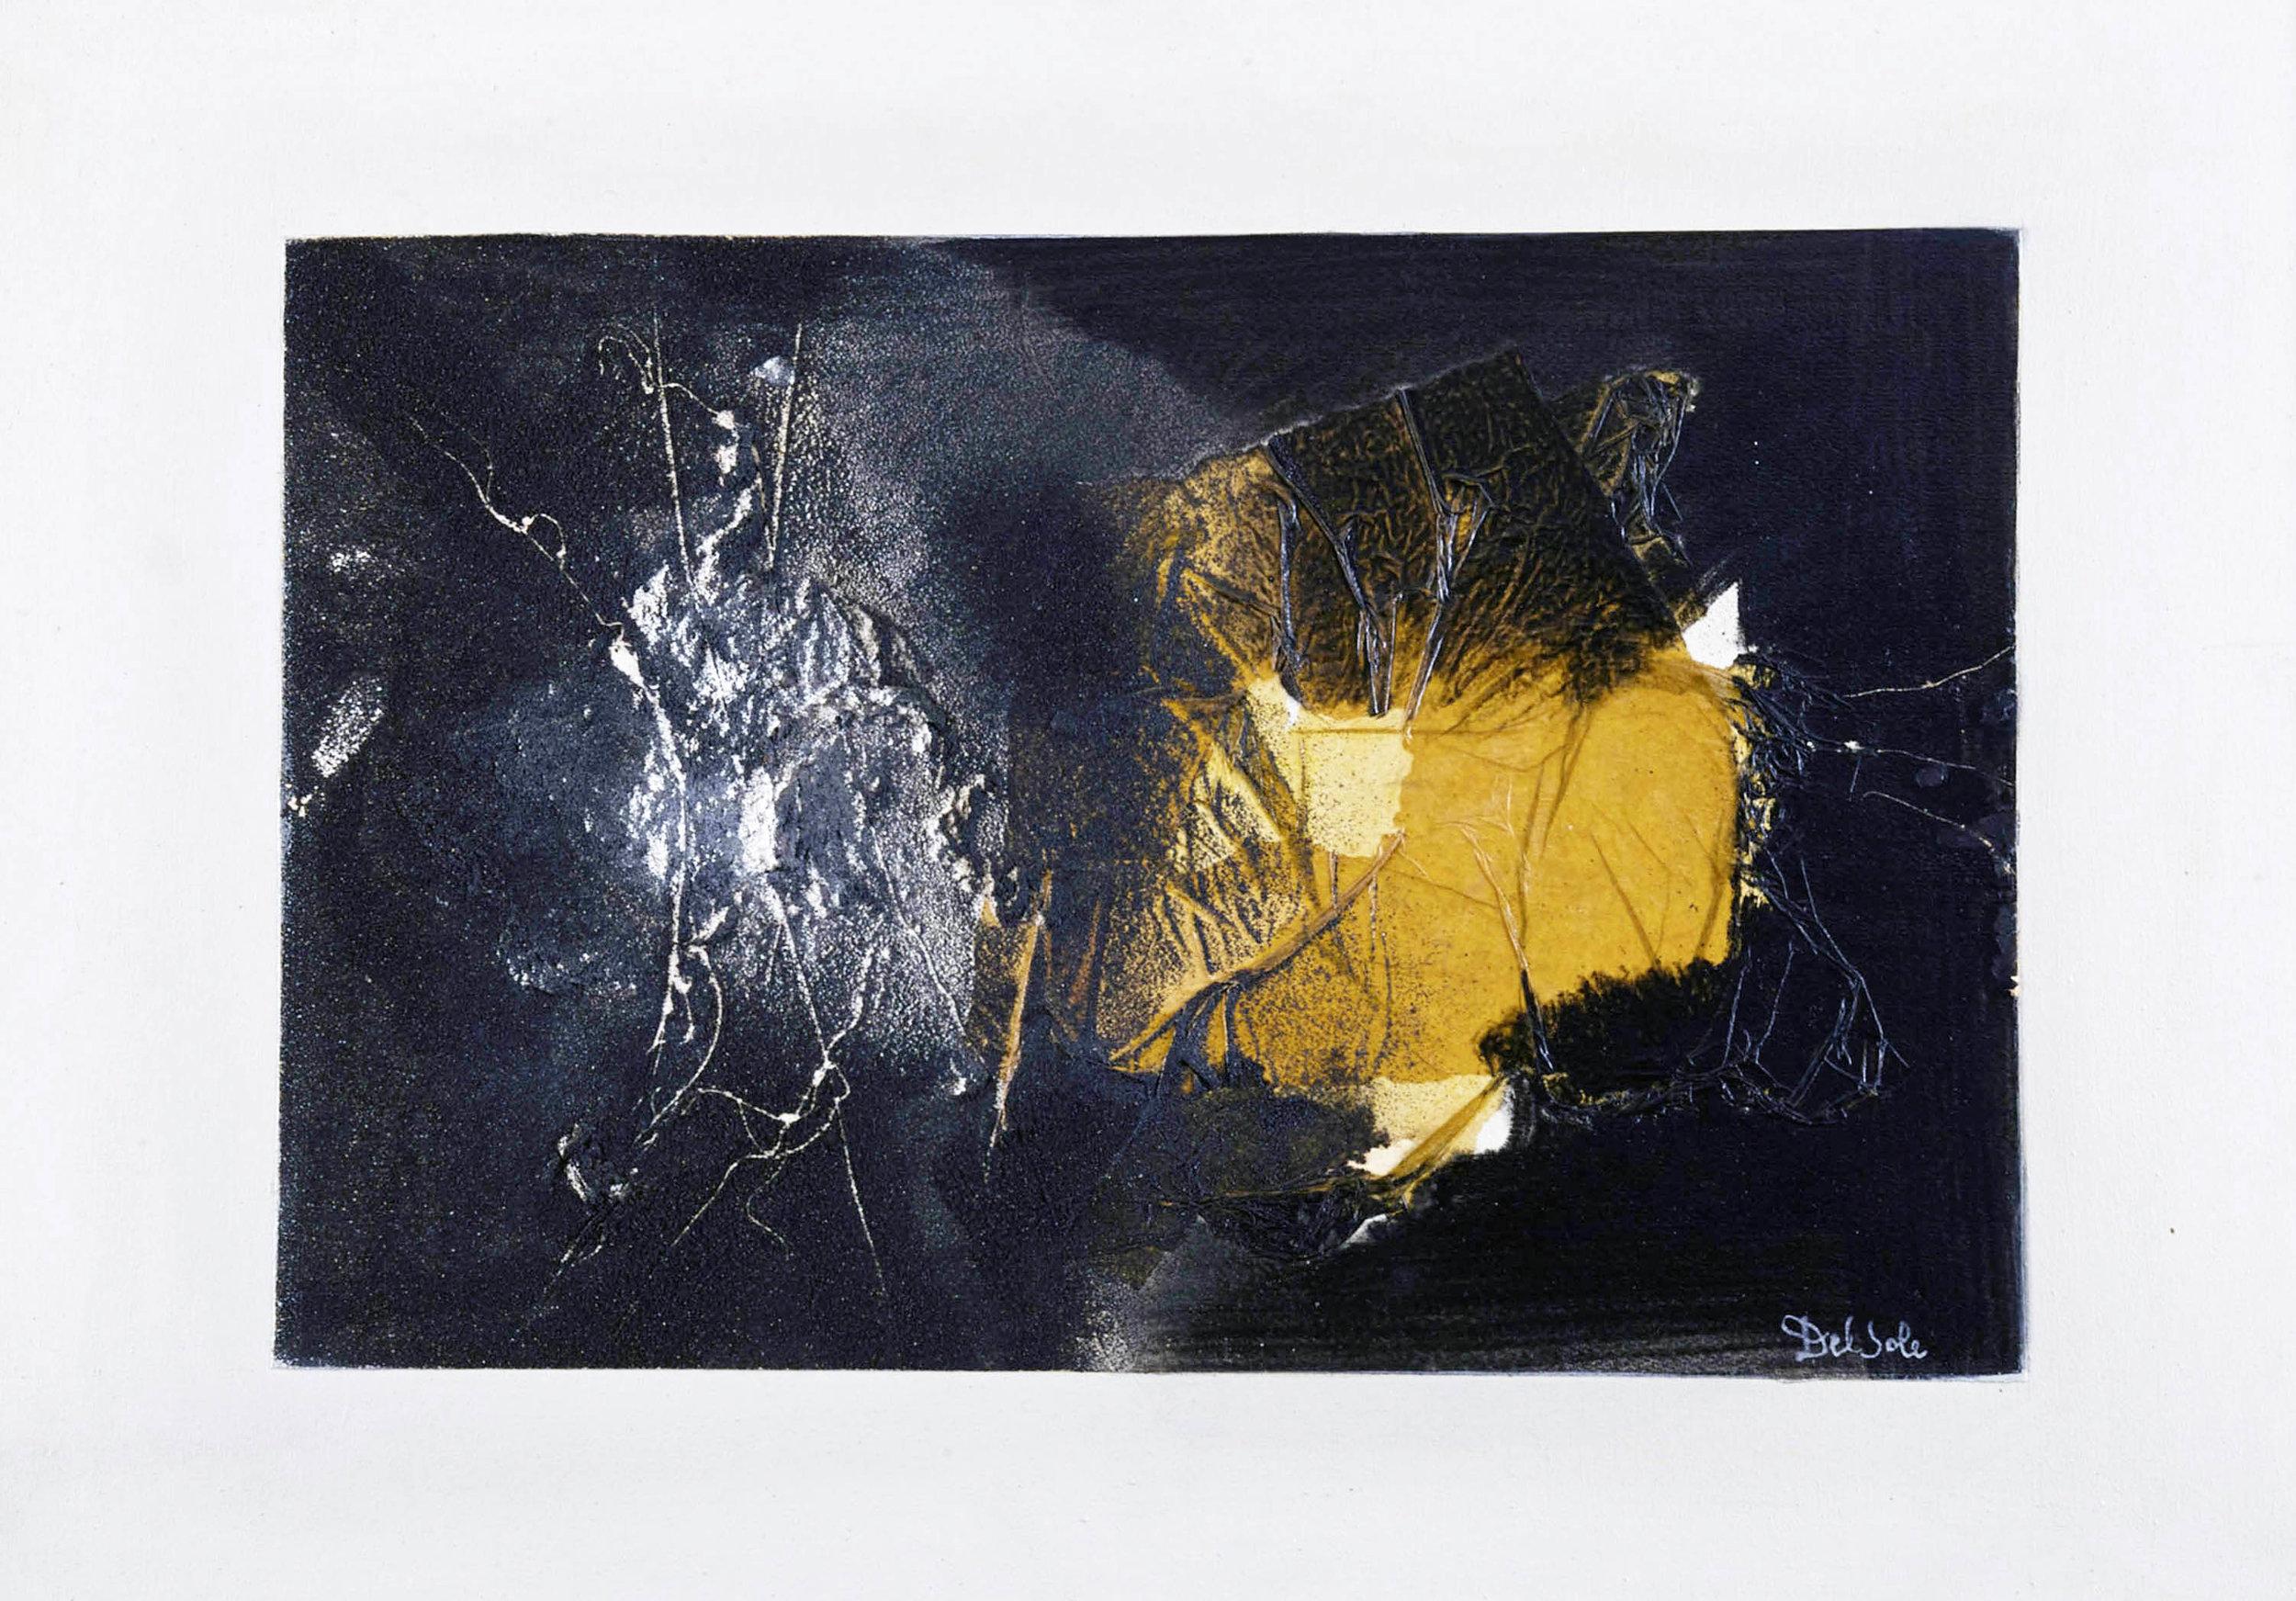 Claudio-Del-Sole_Energie-Antitetiche